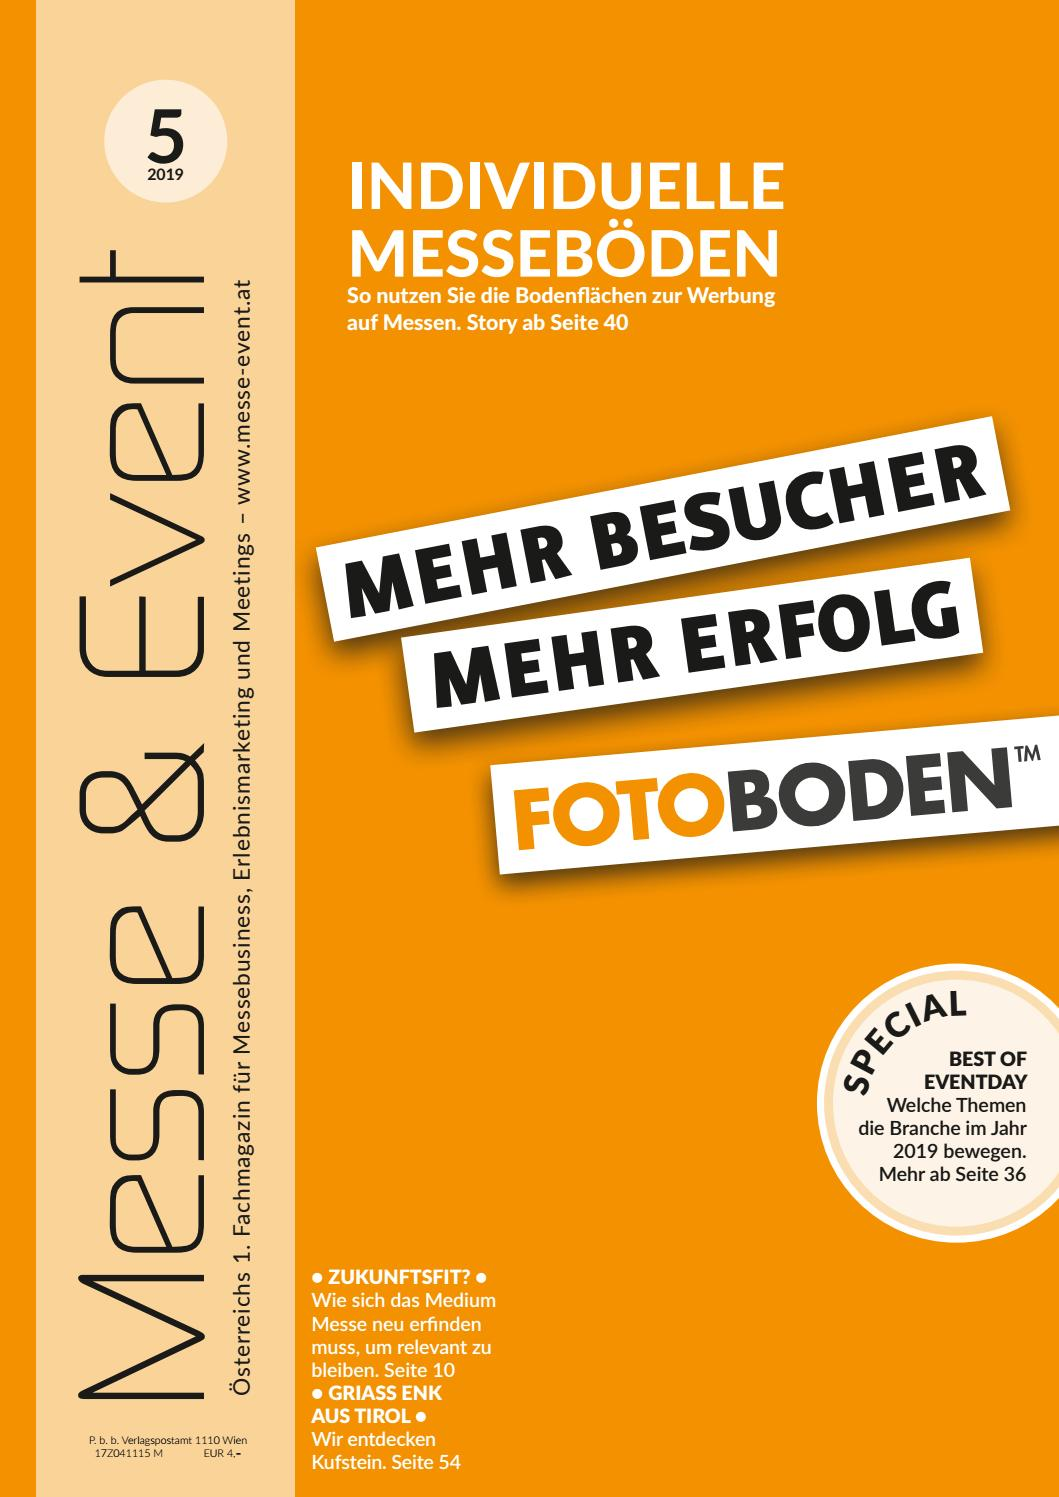 Messe & Event Magazin, Ausgabe 52019 by CRM Medientrend